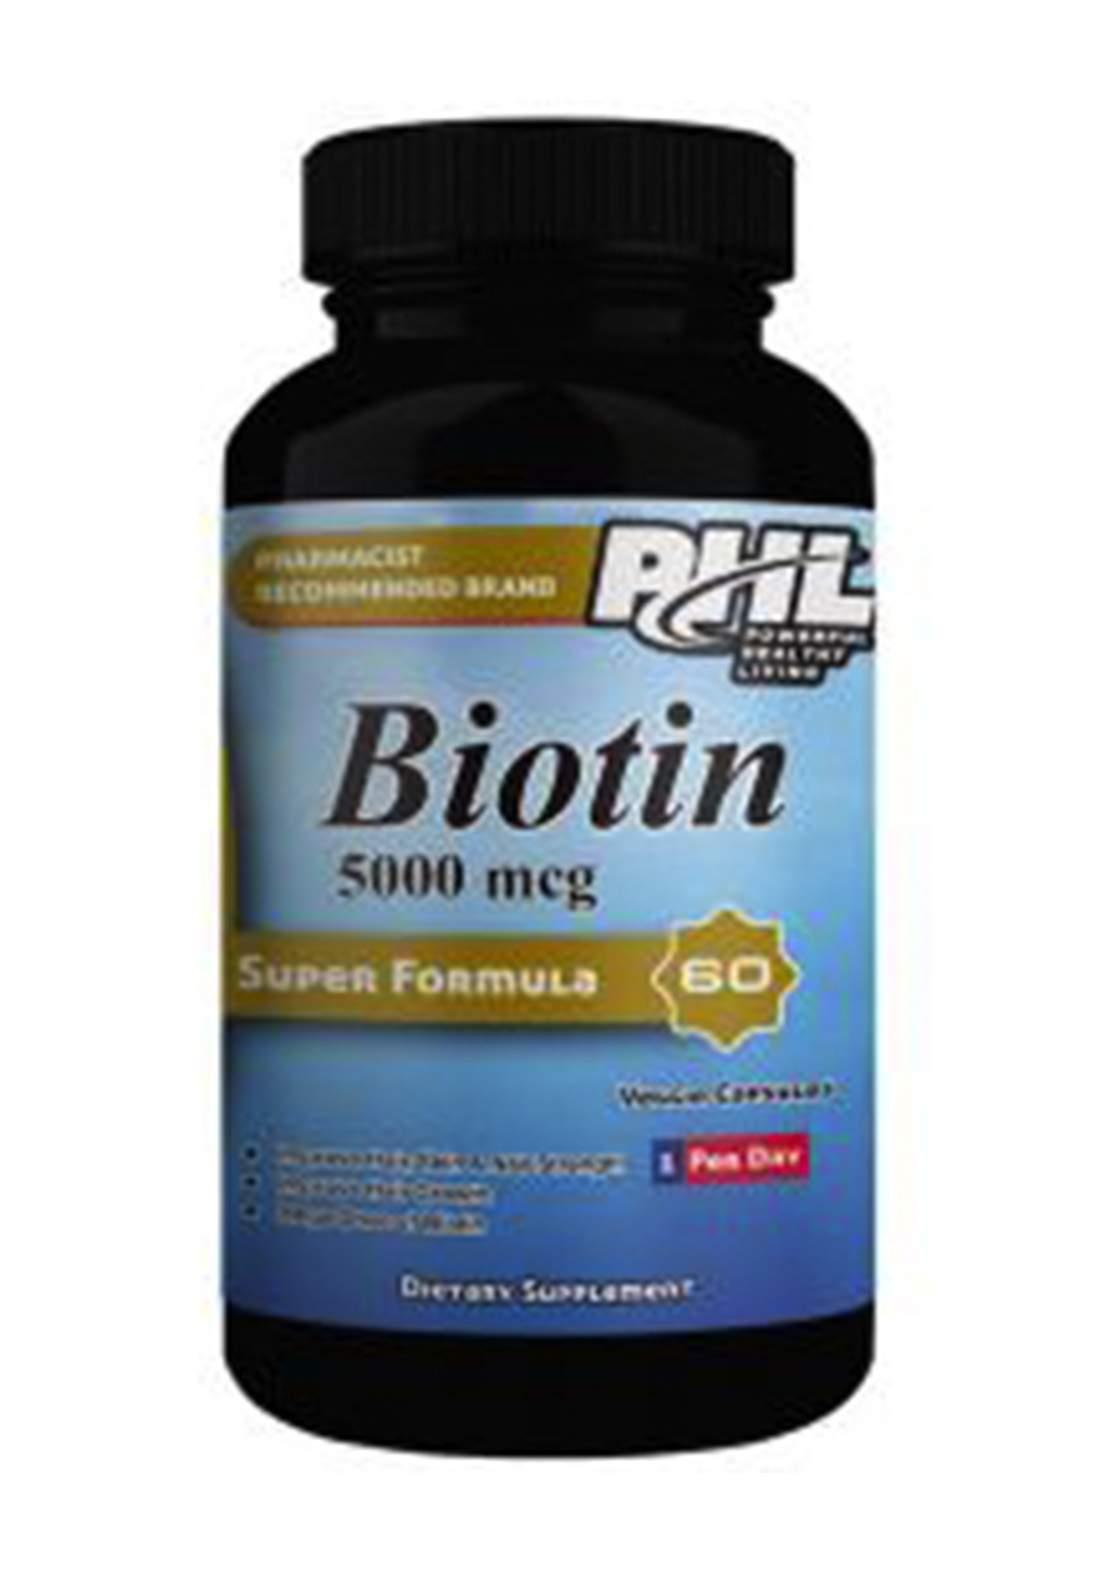 Phl Biotin 5000mcg - 60 Tablets مكمل غذائي